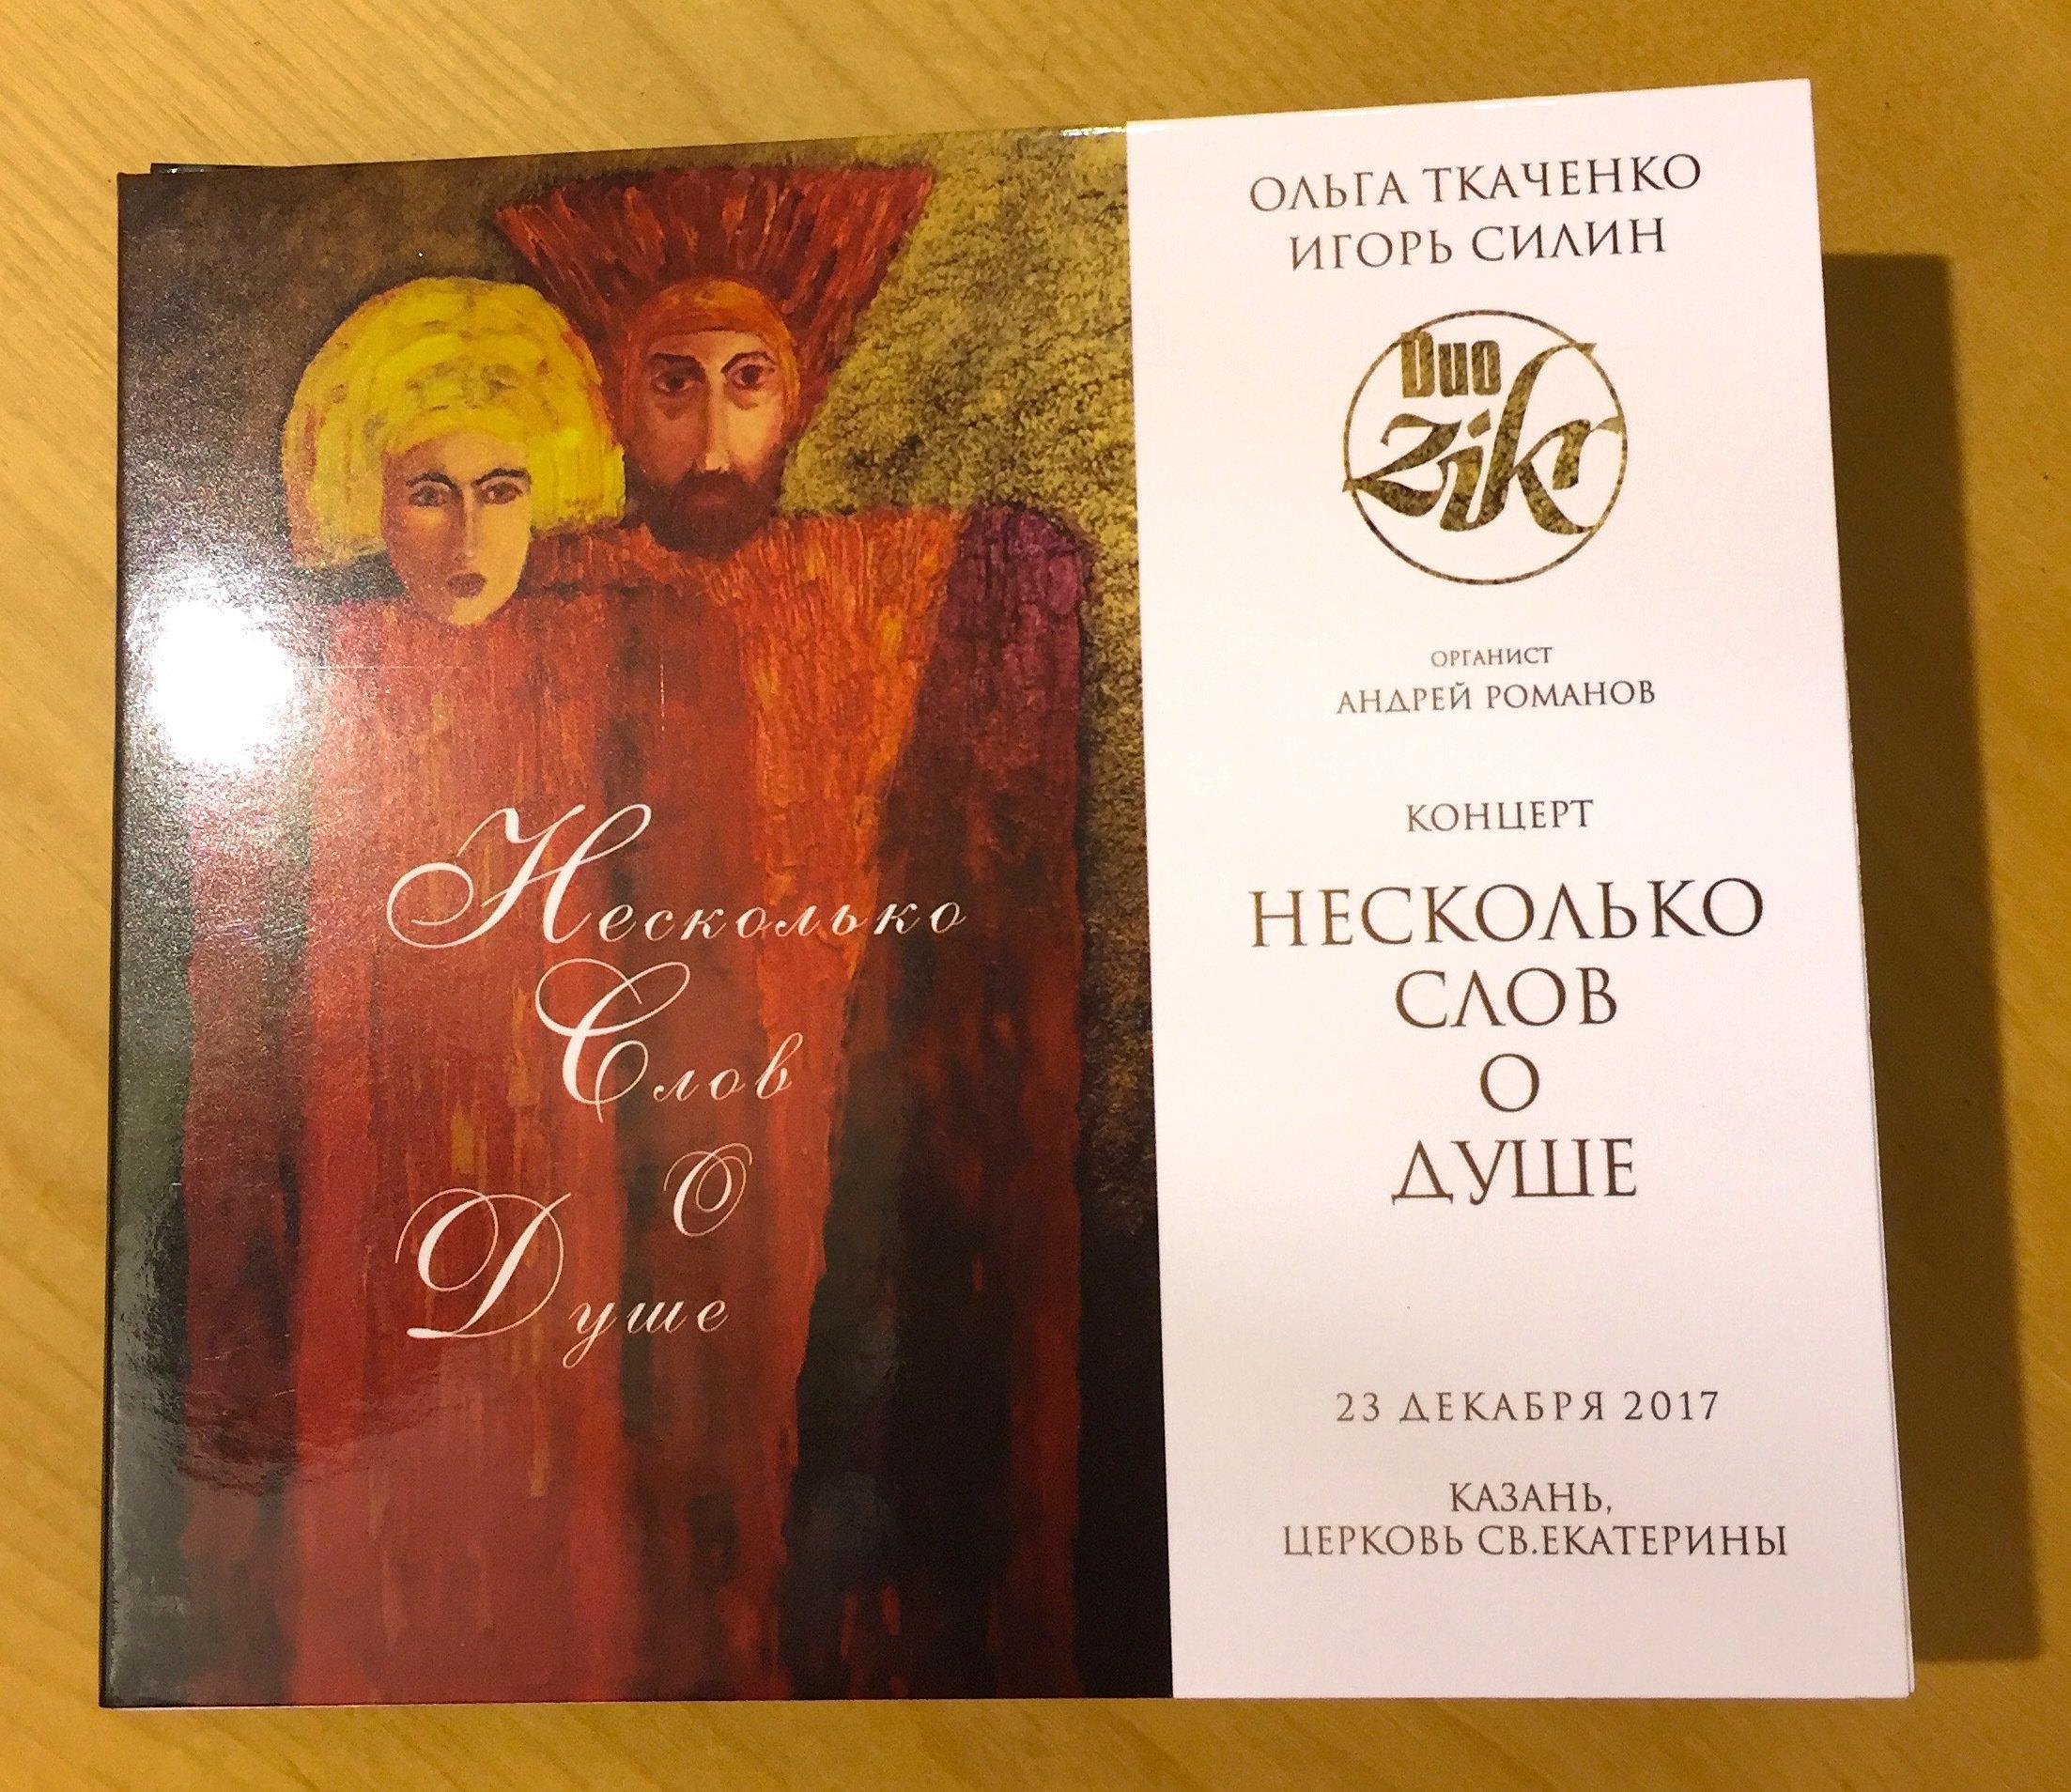 CD Duo Zikr «Несколько слов о душе» 00139